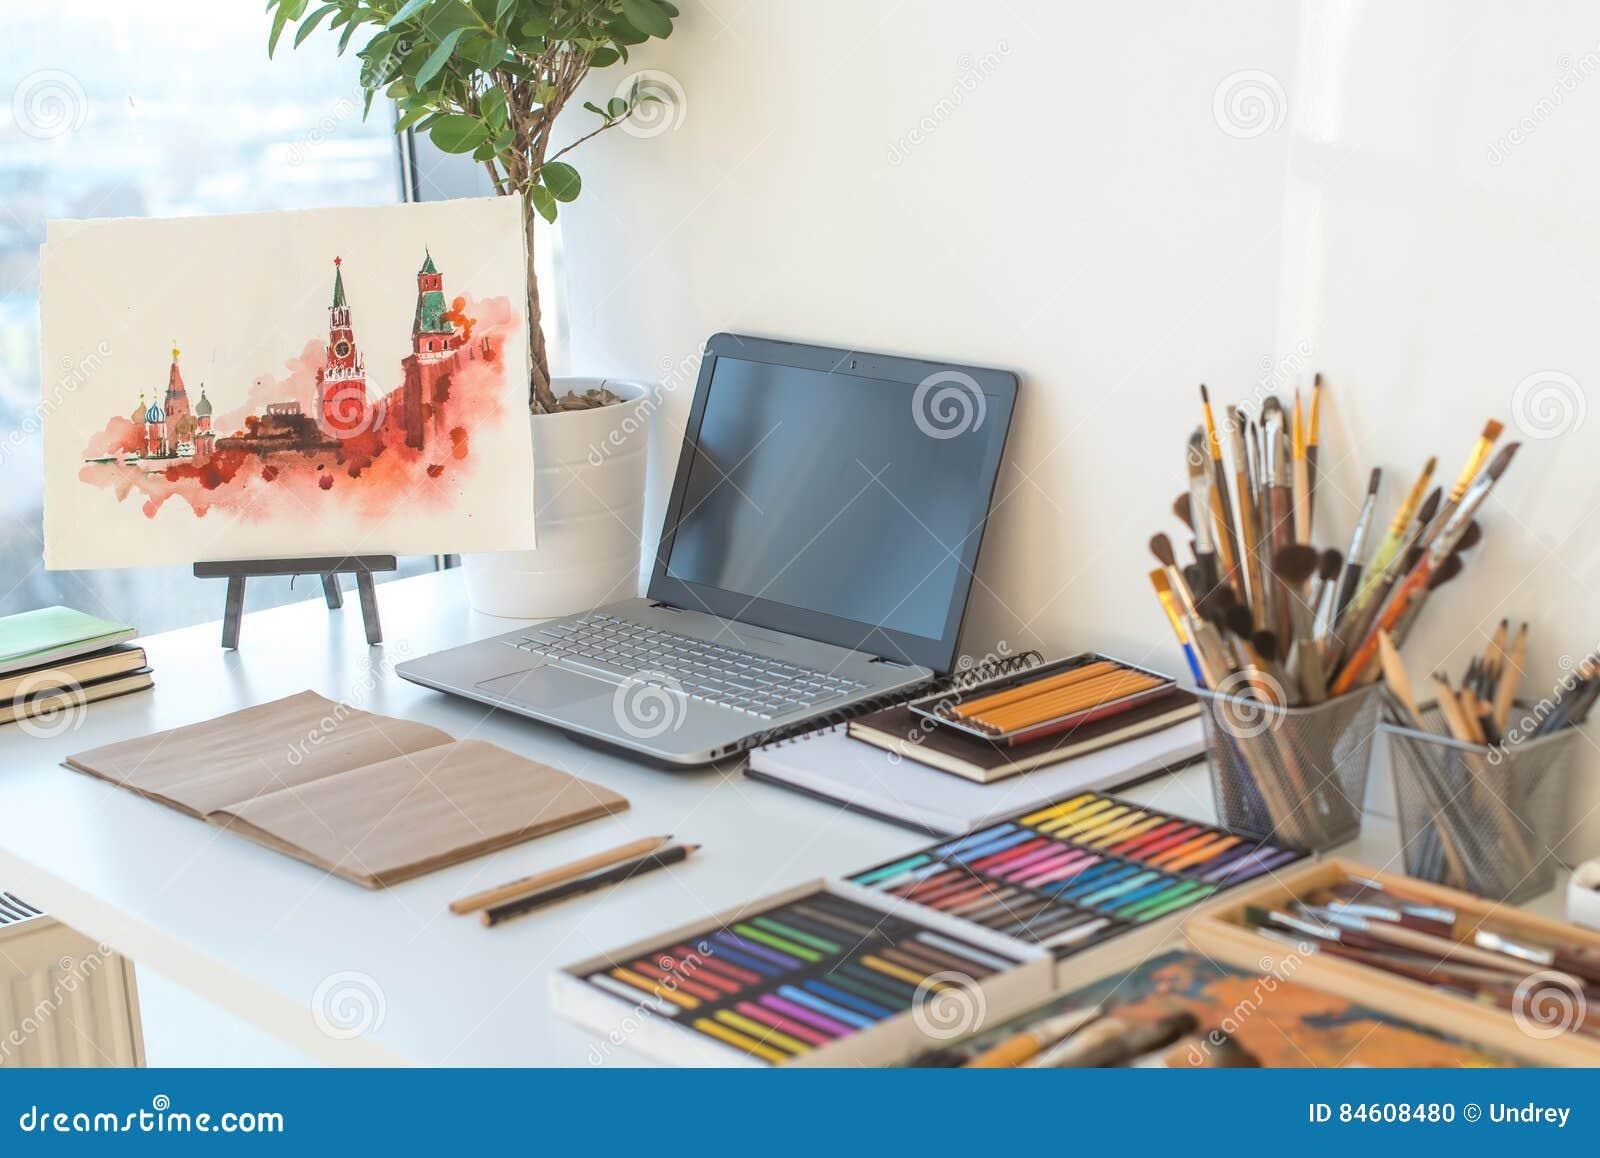 Painter workplace in order side view designer desk with - Mesa de dibujo tecnico ...